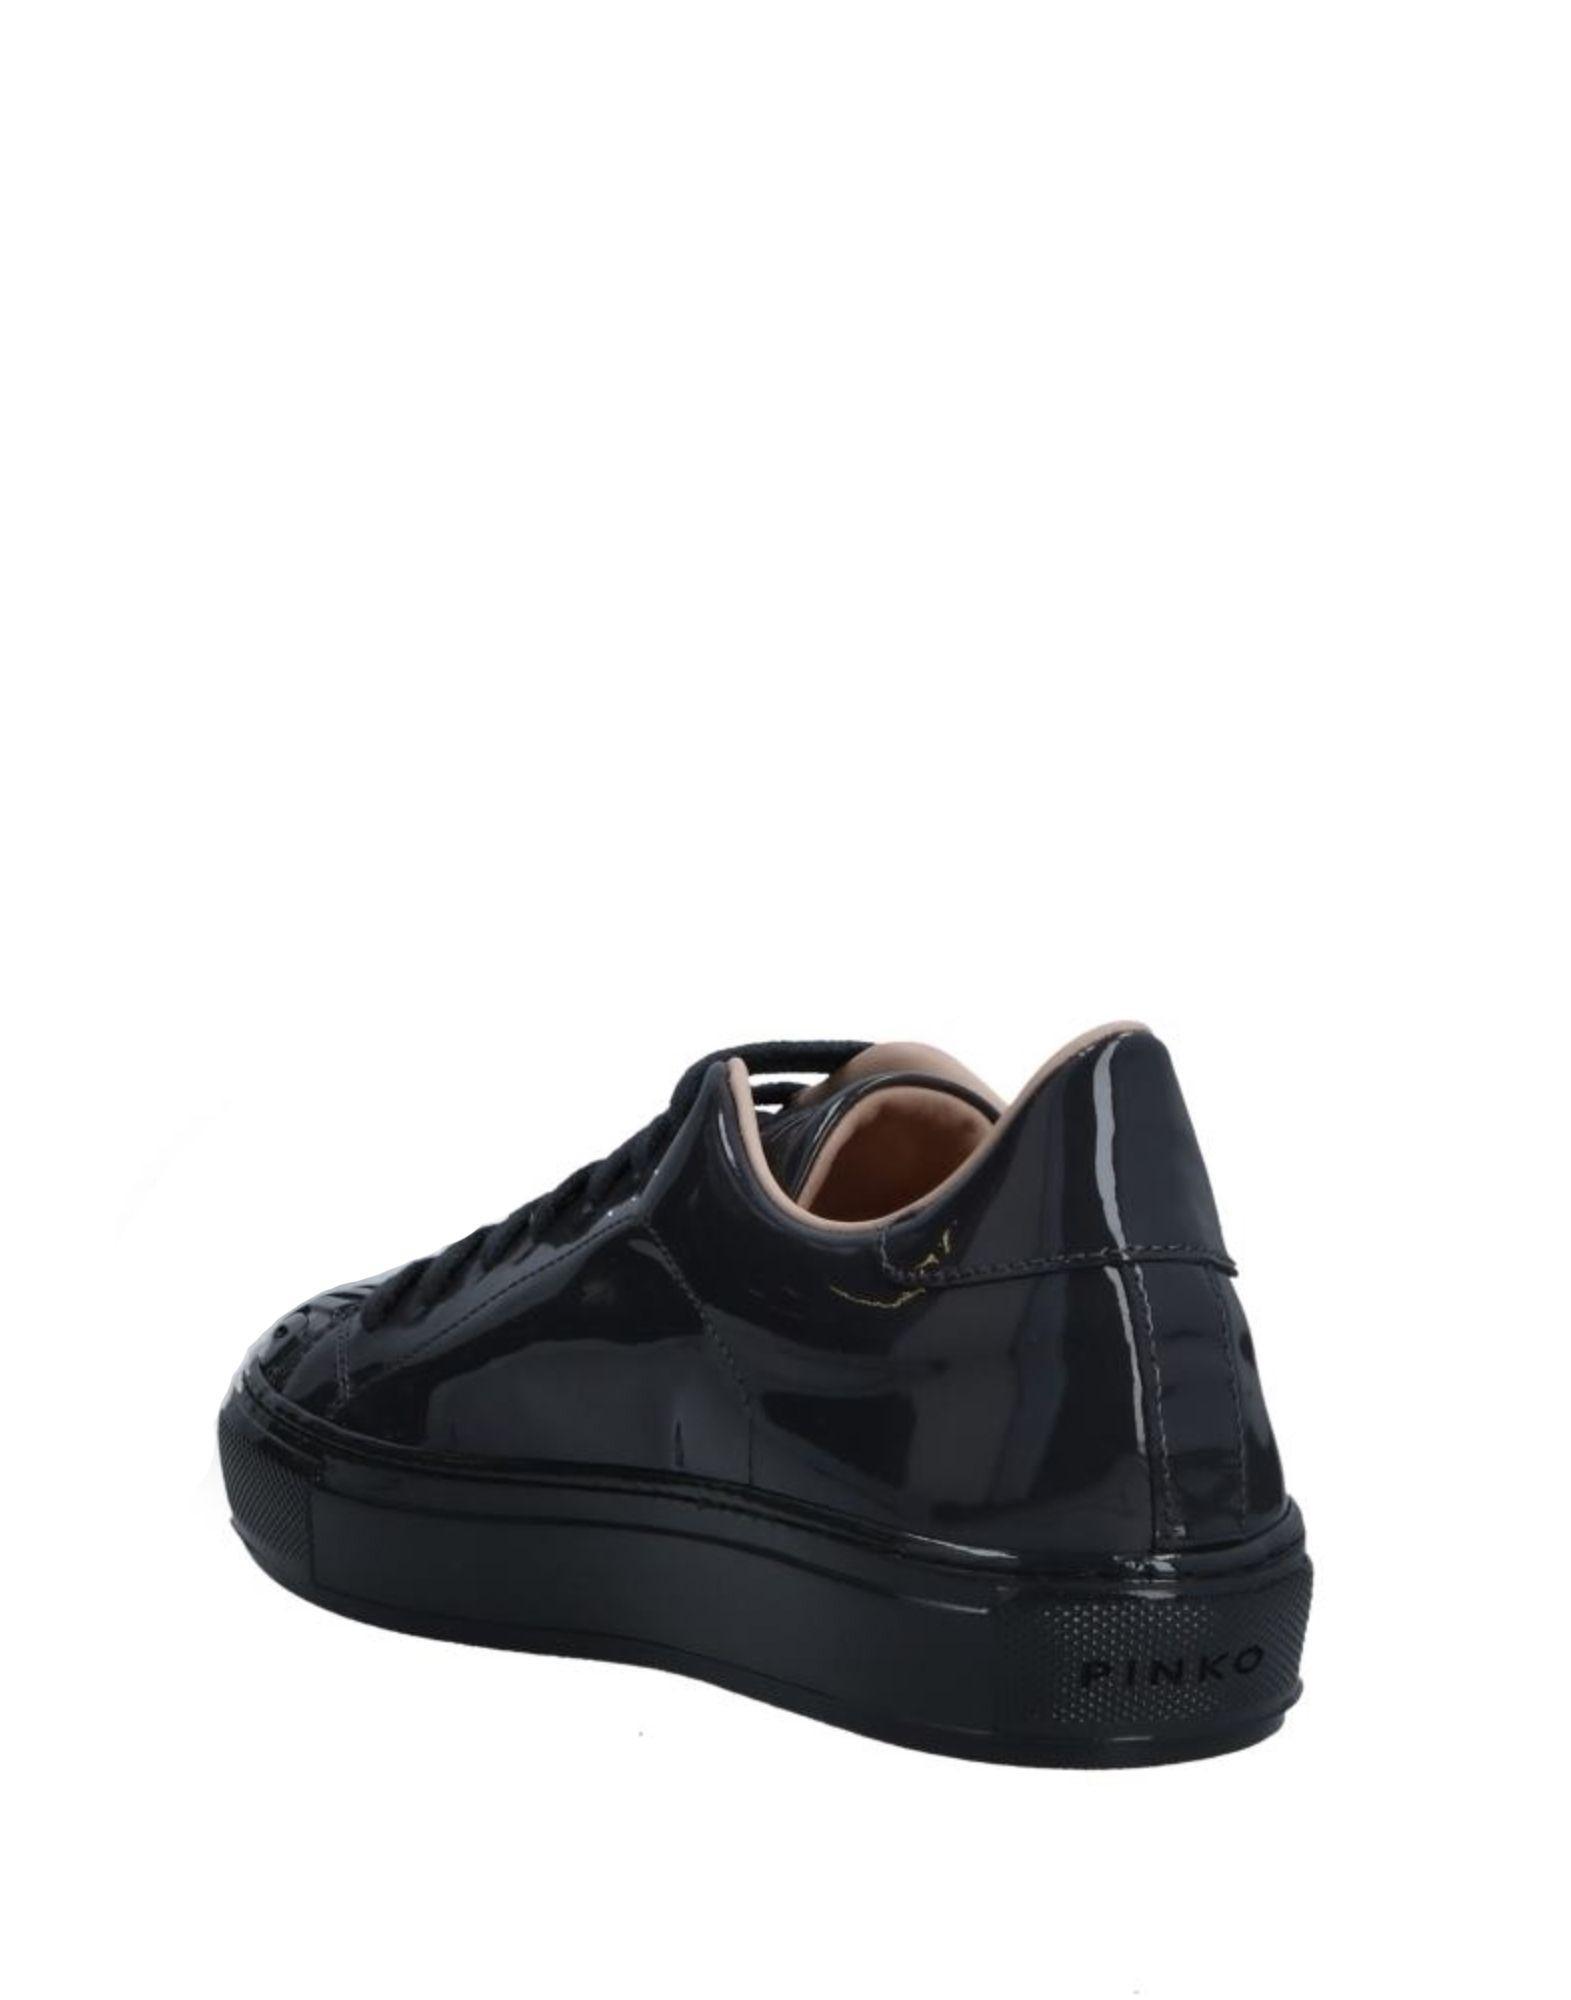 Pinko Leather Low-tops & Sneakers in Steel Grey (Grey)